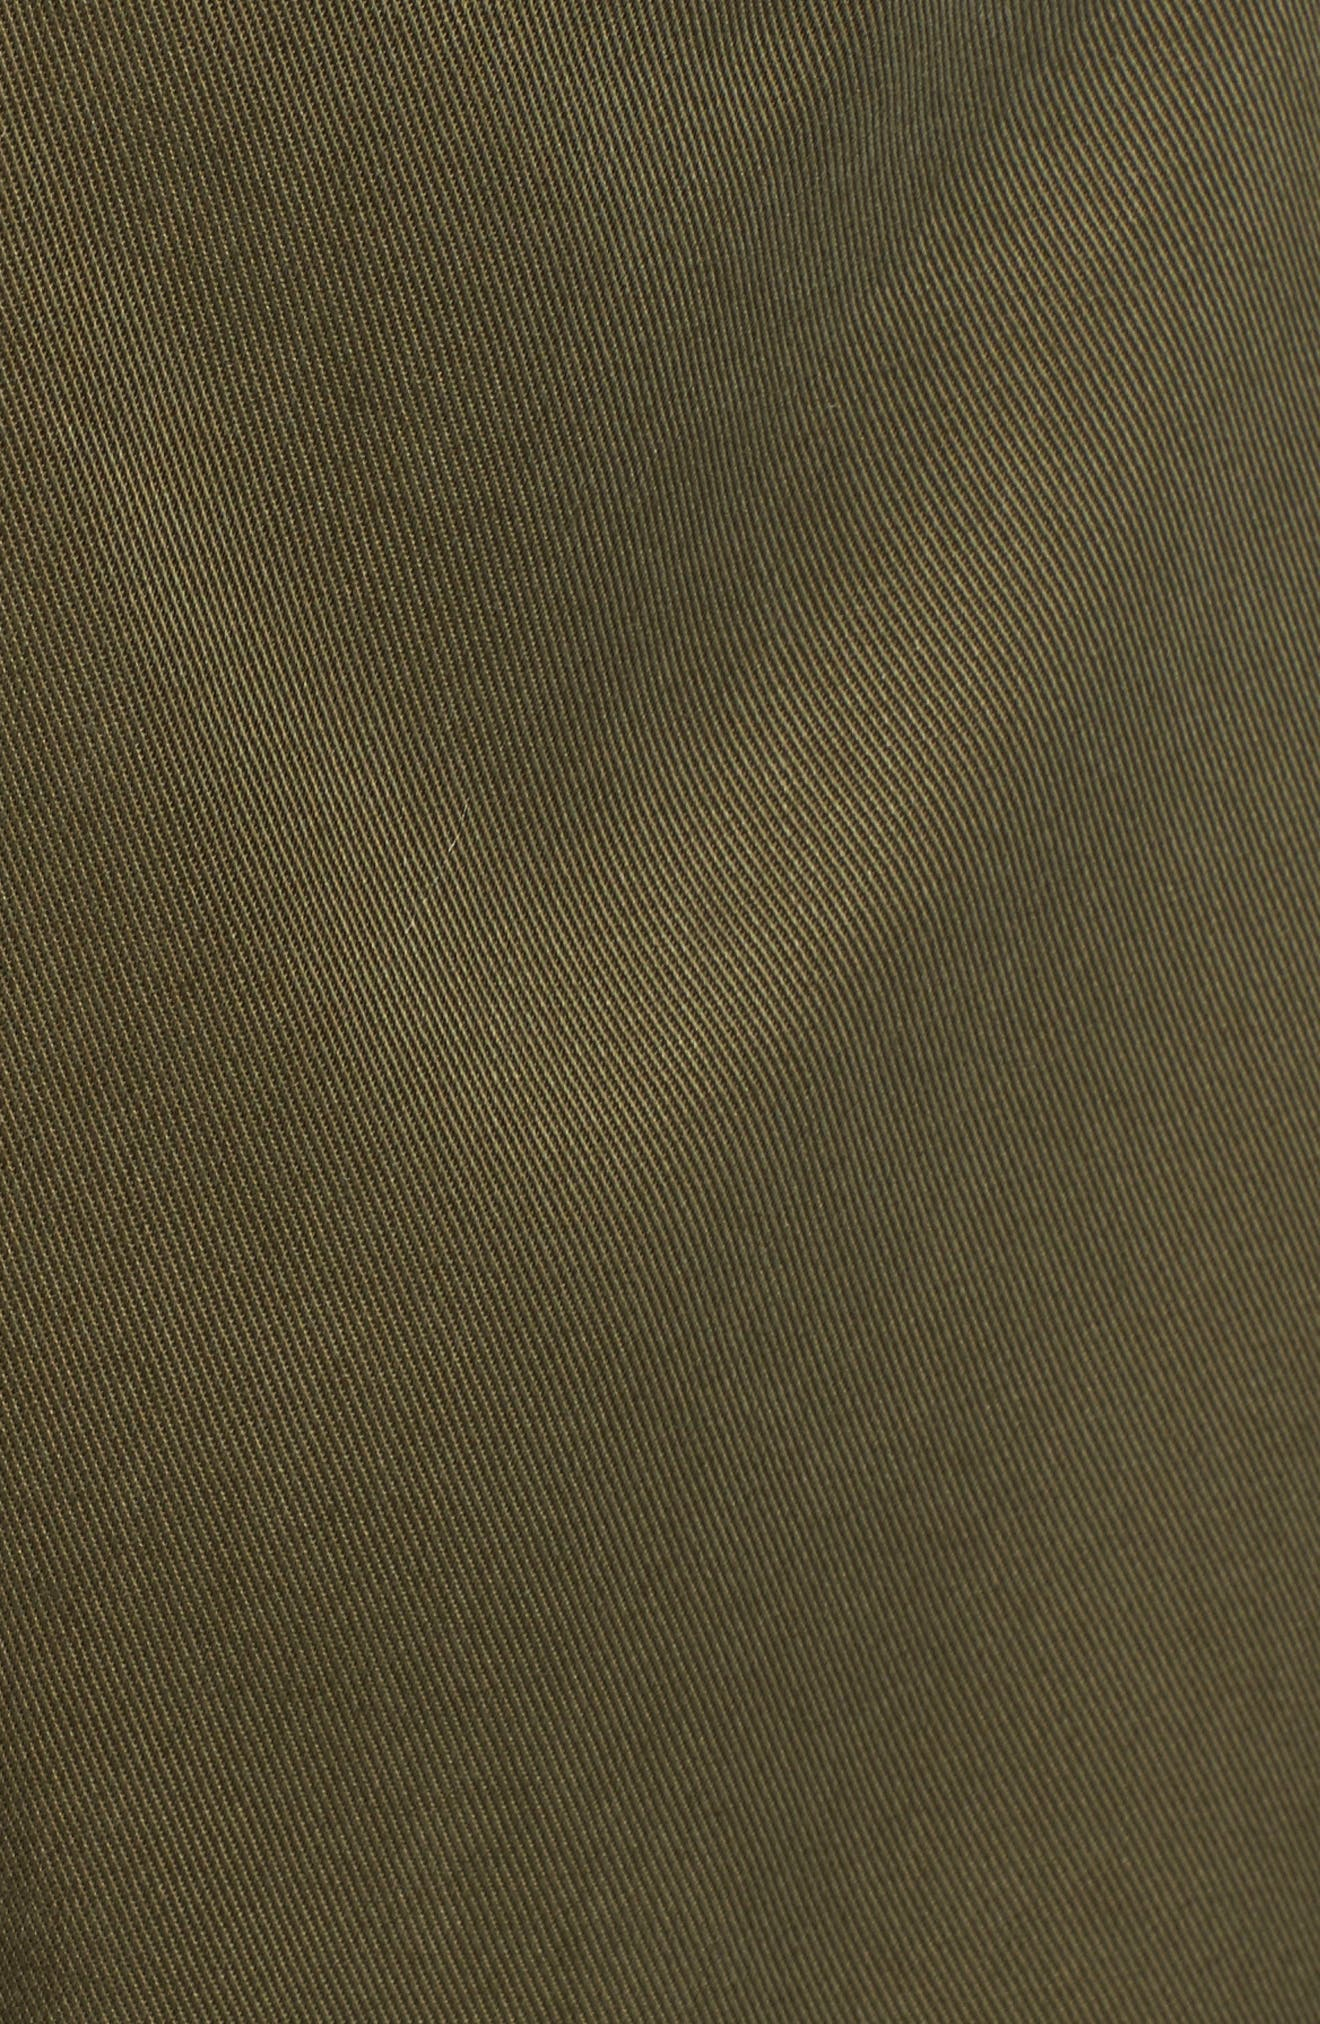 Averie Drawstring Waist Army Coat,                             Alternate thumbnail 5, color,                             Sage